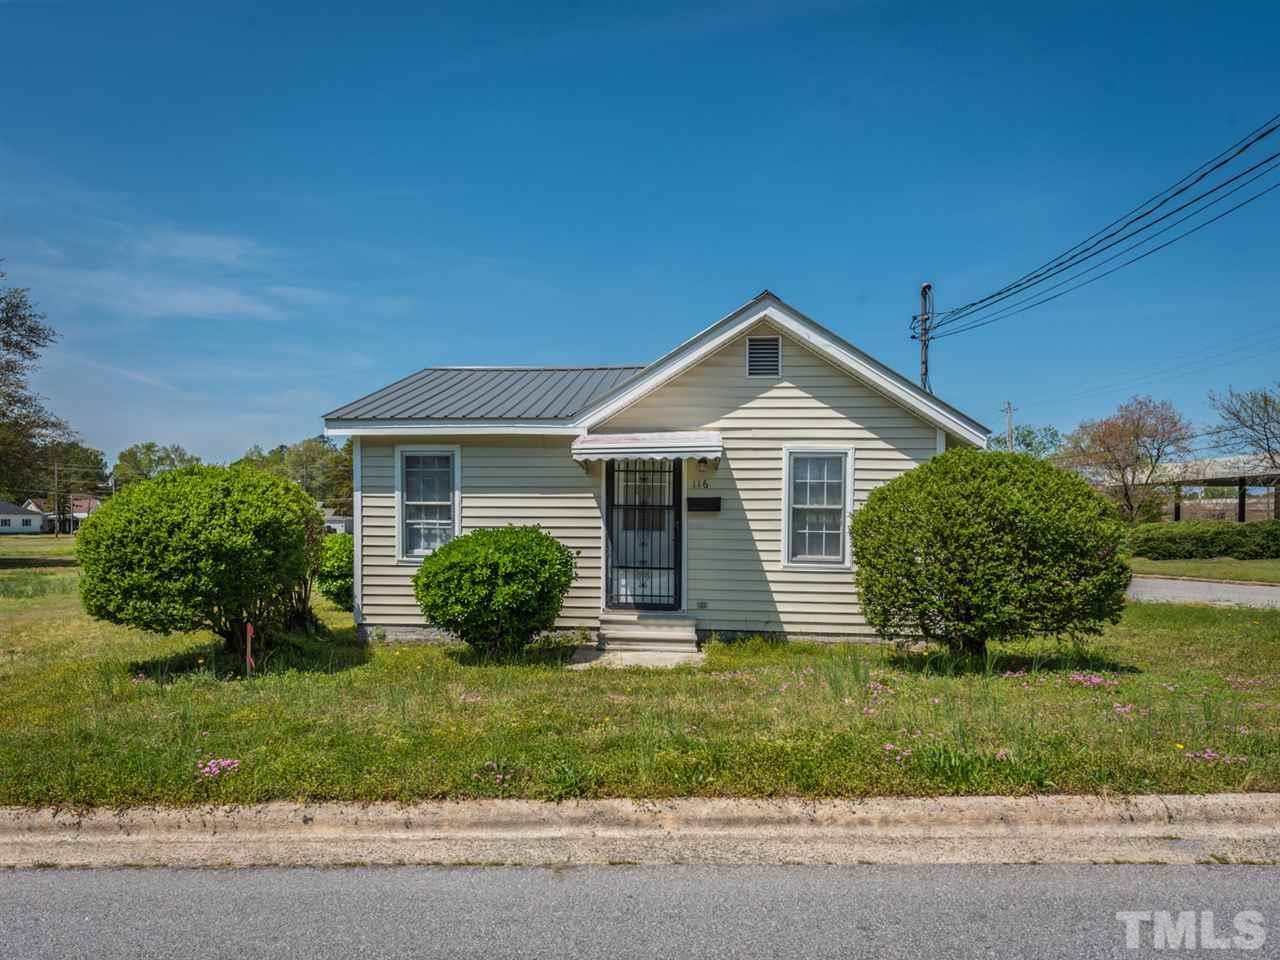 116 S SEVENTH STREET, SMITHFIELD, NC 27577